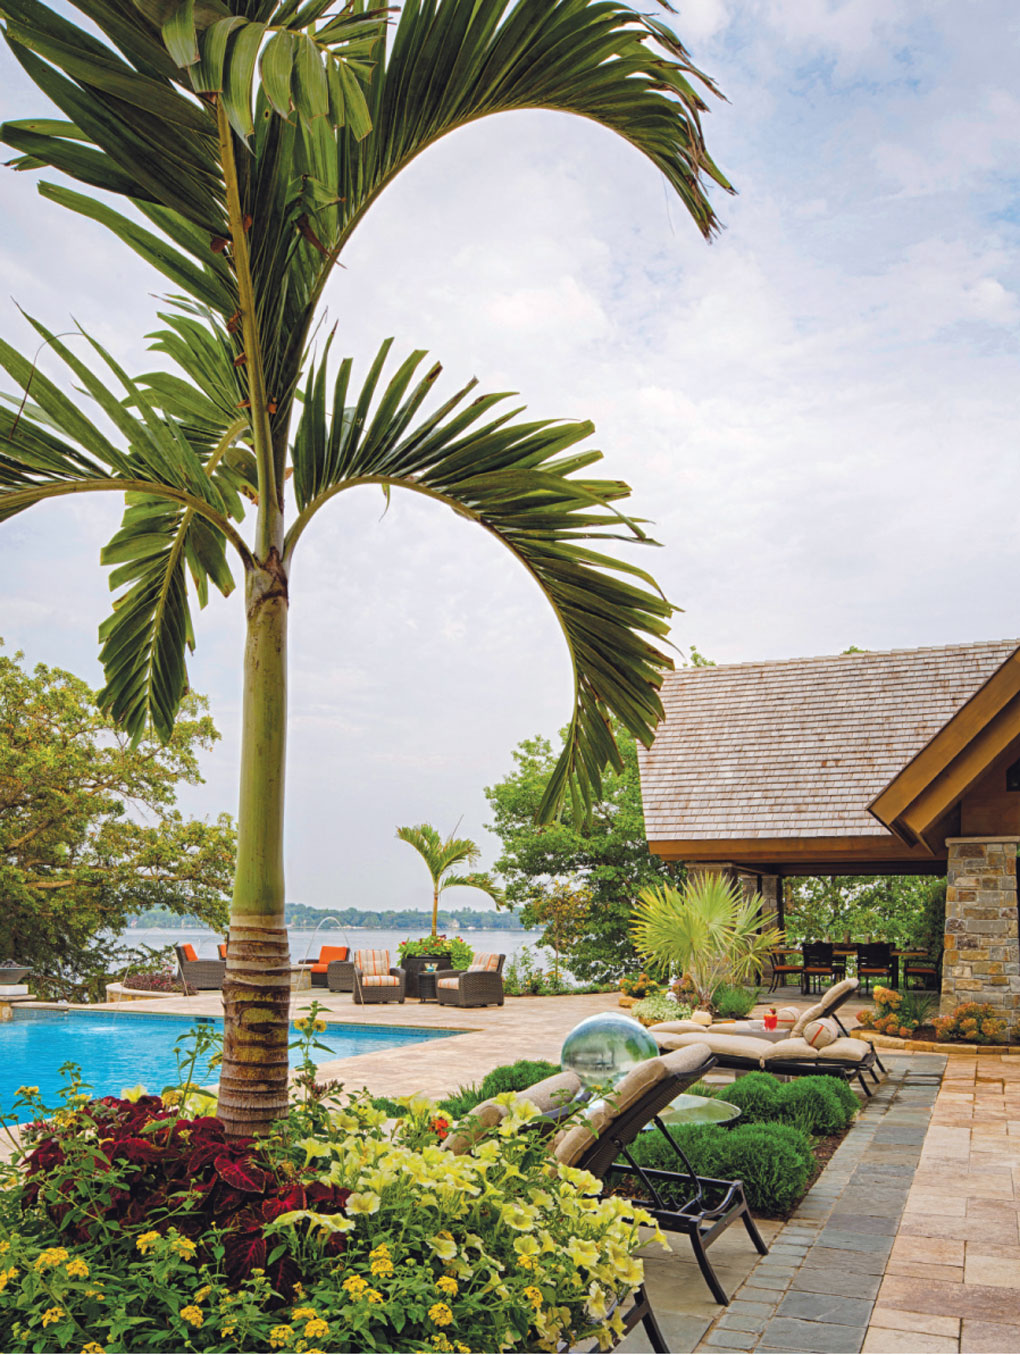 Poolside palm tree